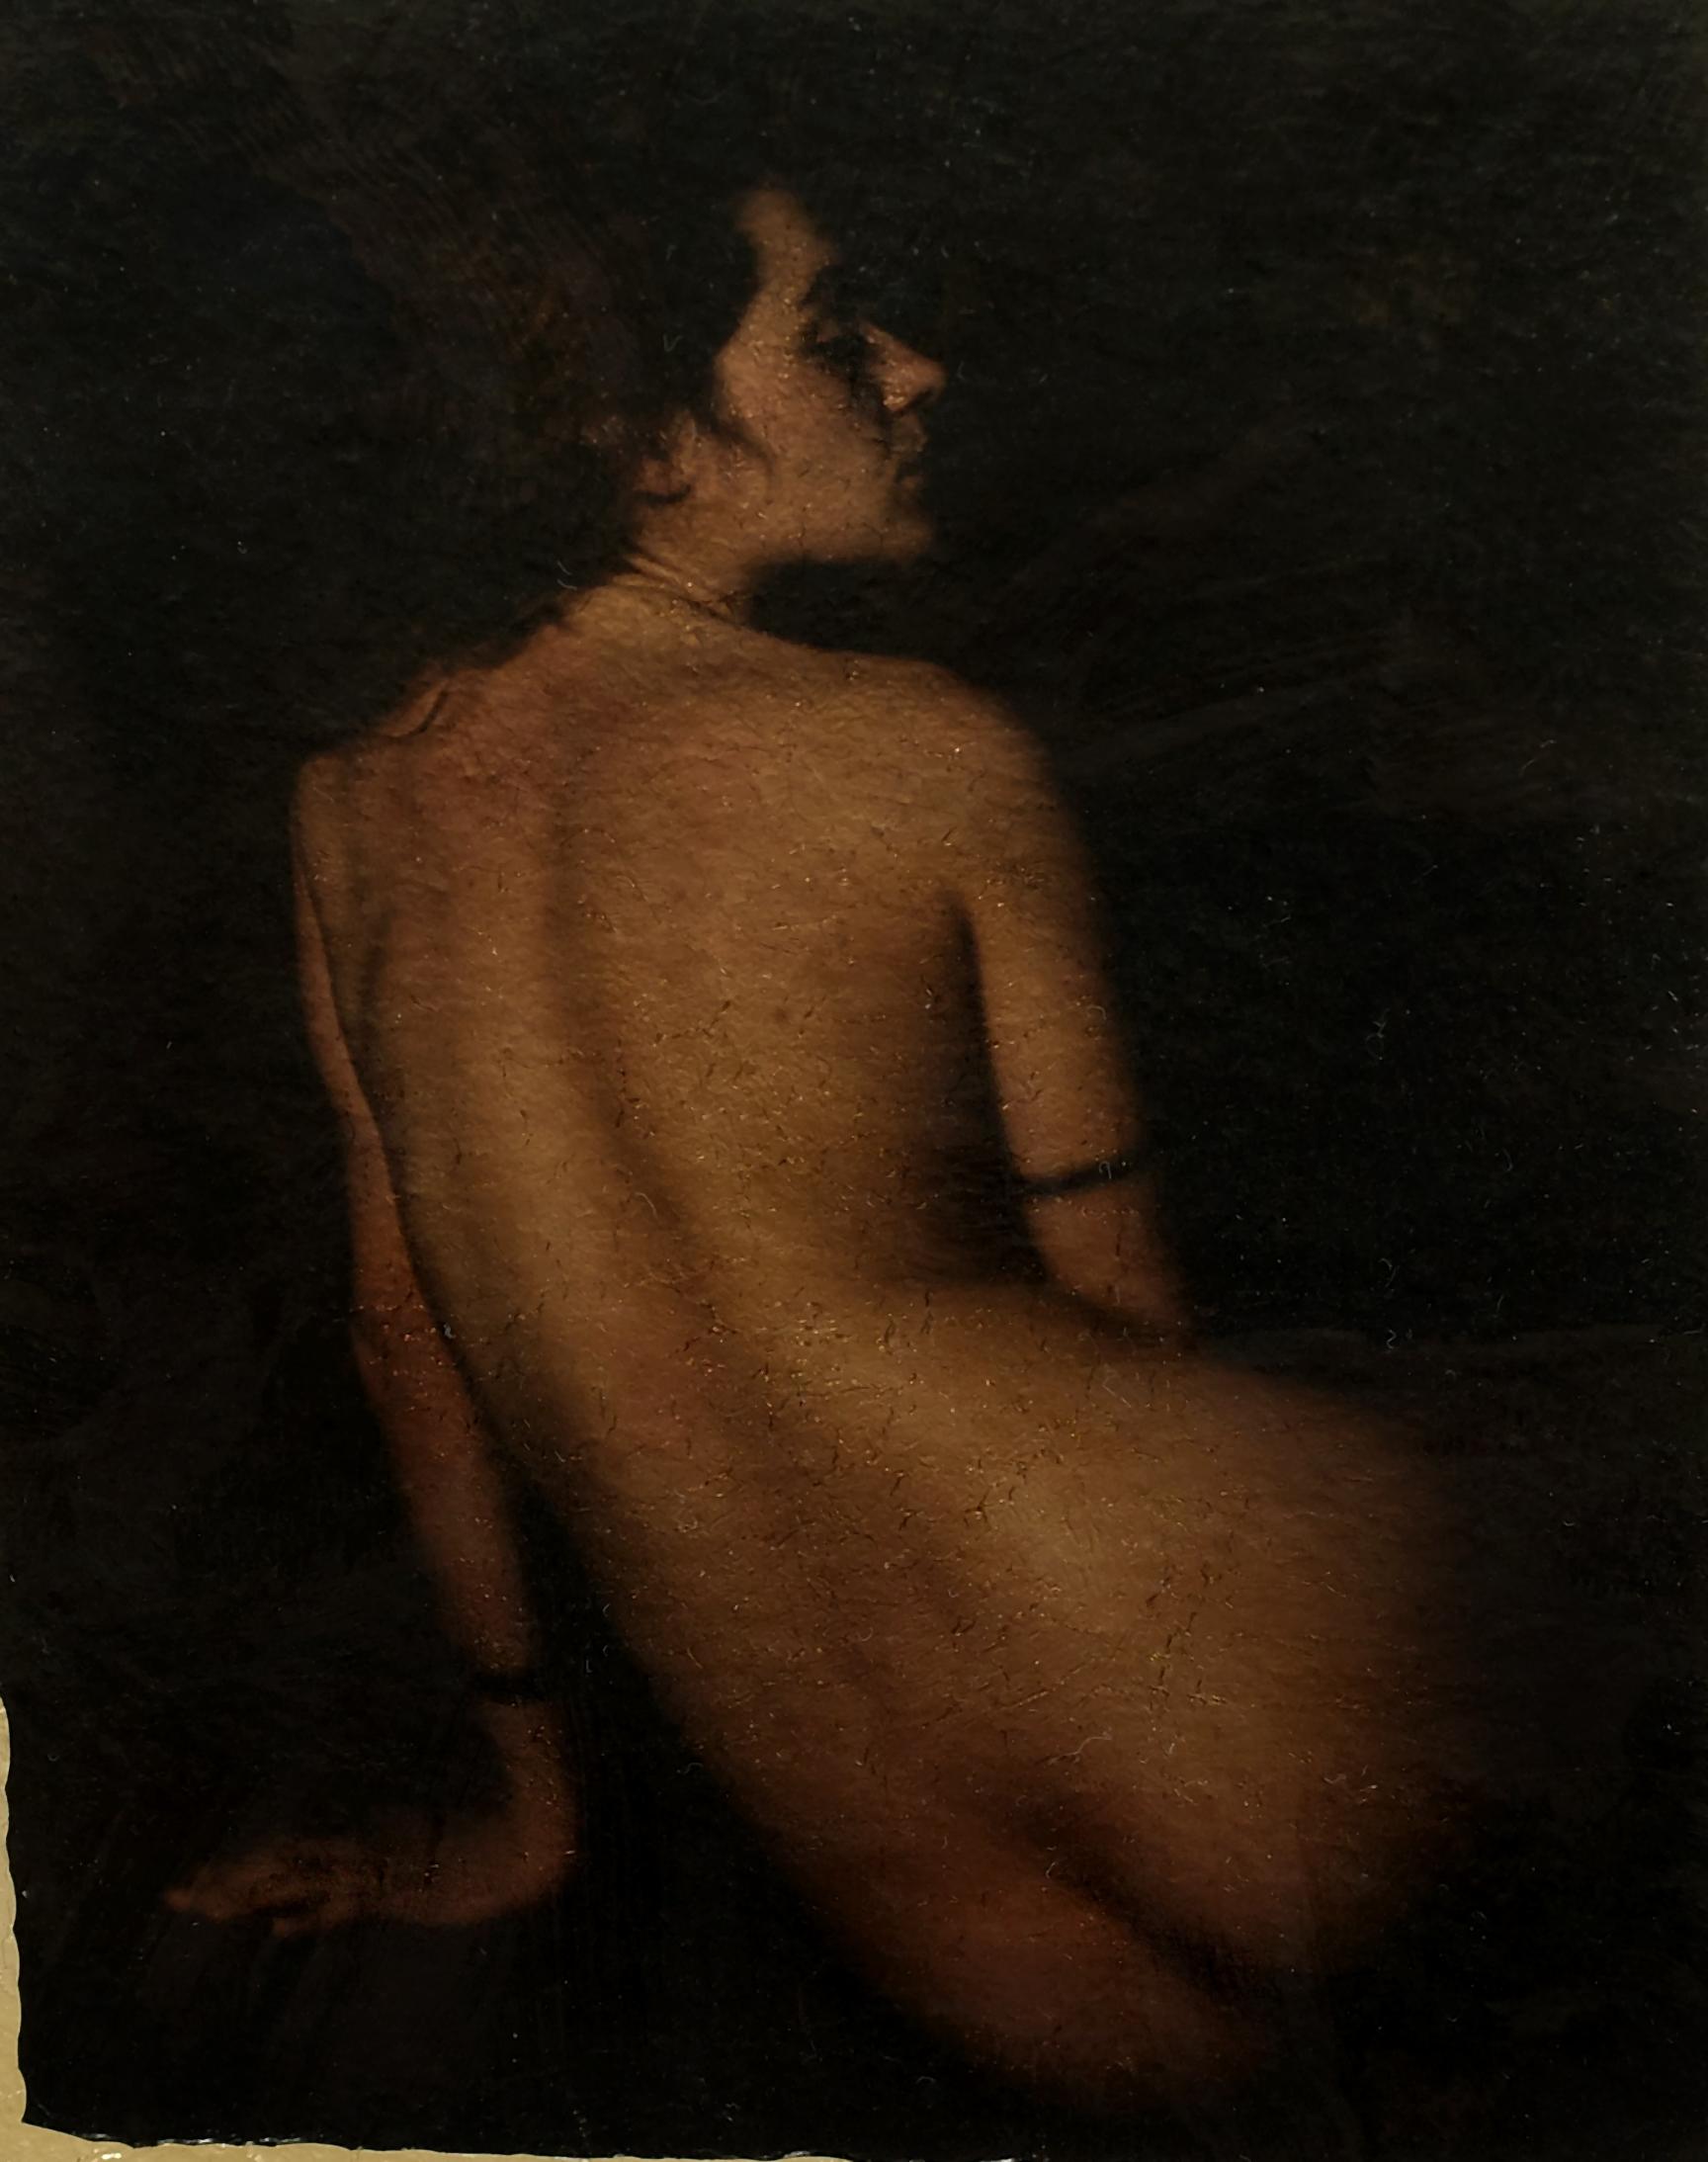 GTB_Fabien-Dettori_FD15_Courtesy Galerie Thierry Bigaignon.jpg